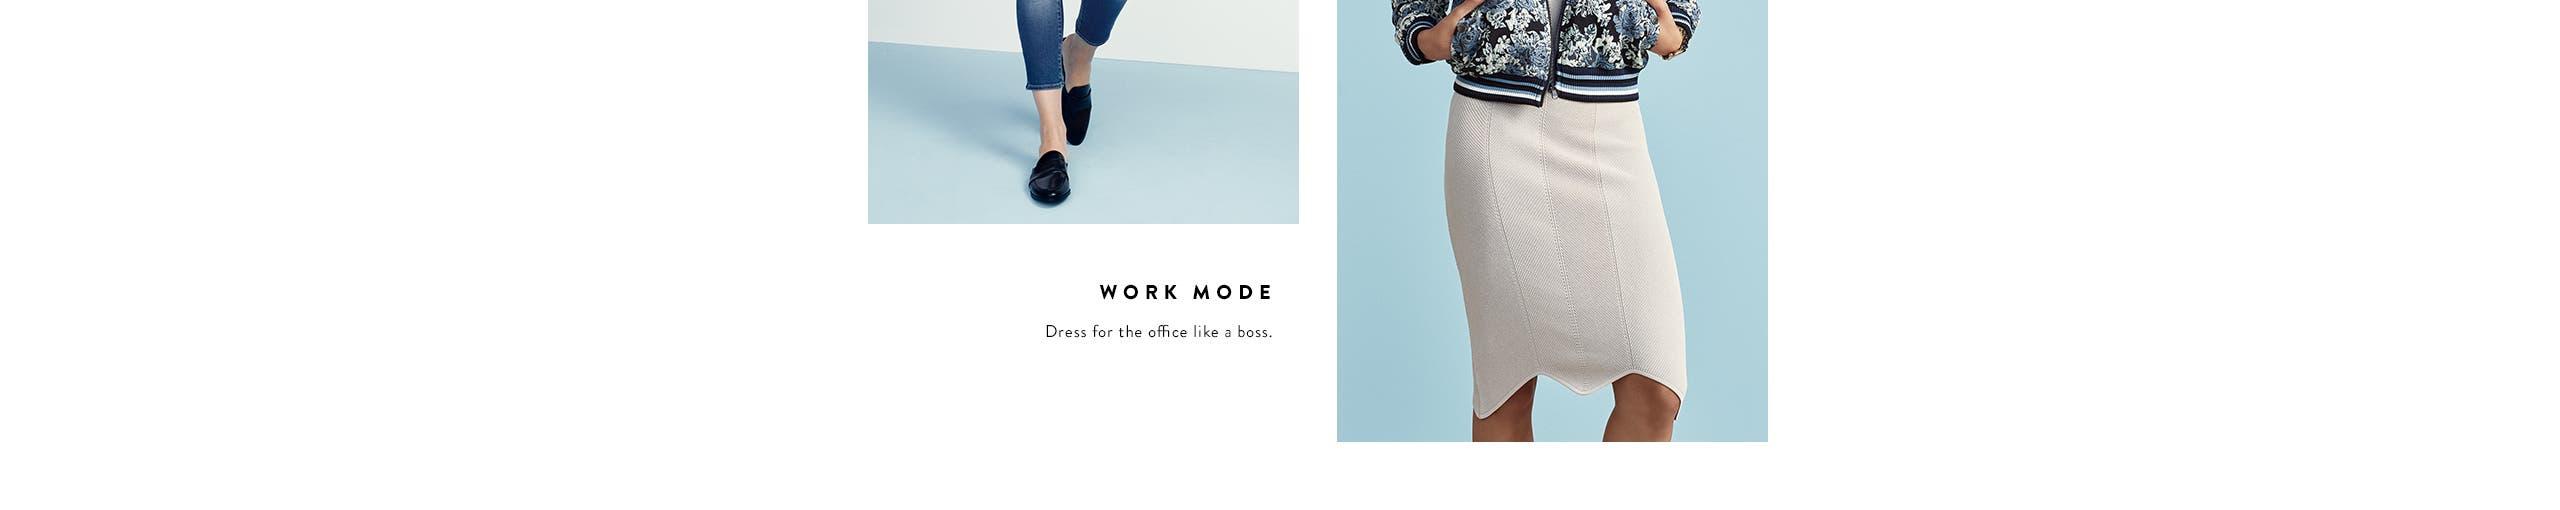 Work mode. Dress for the office like a boss.